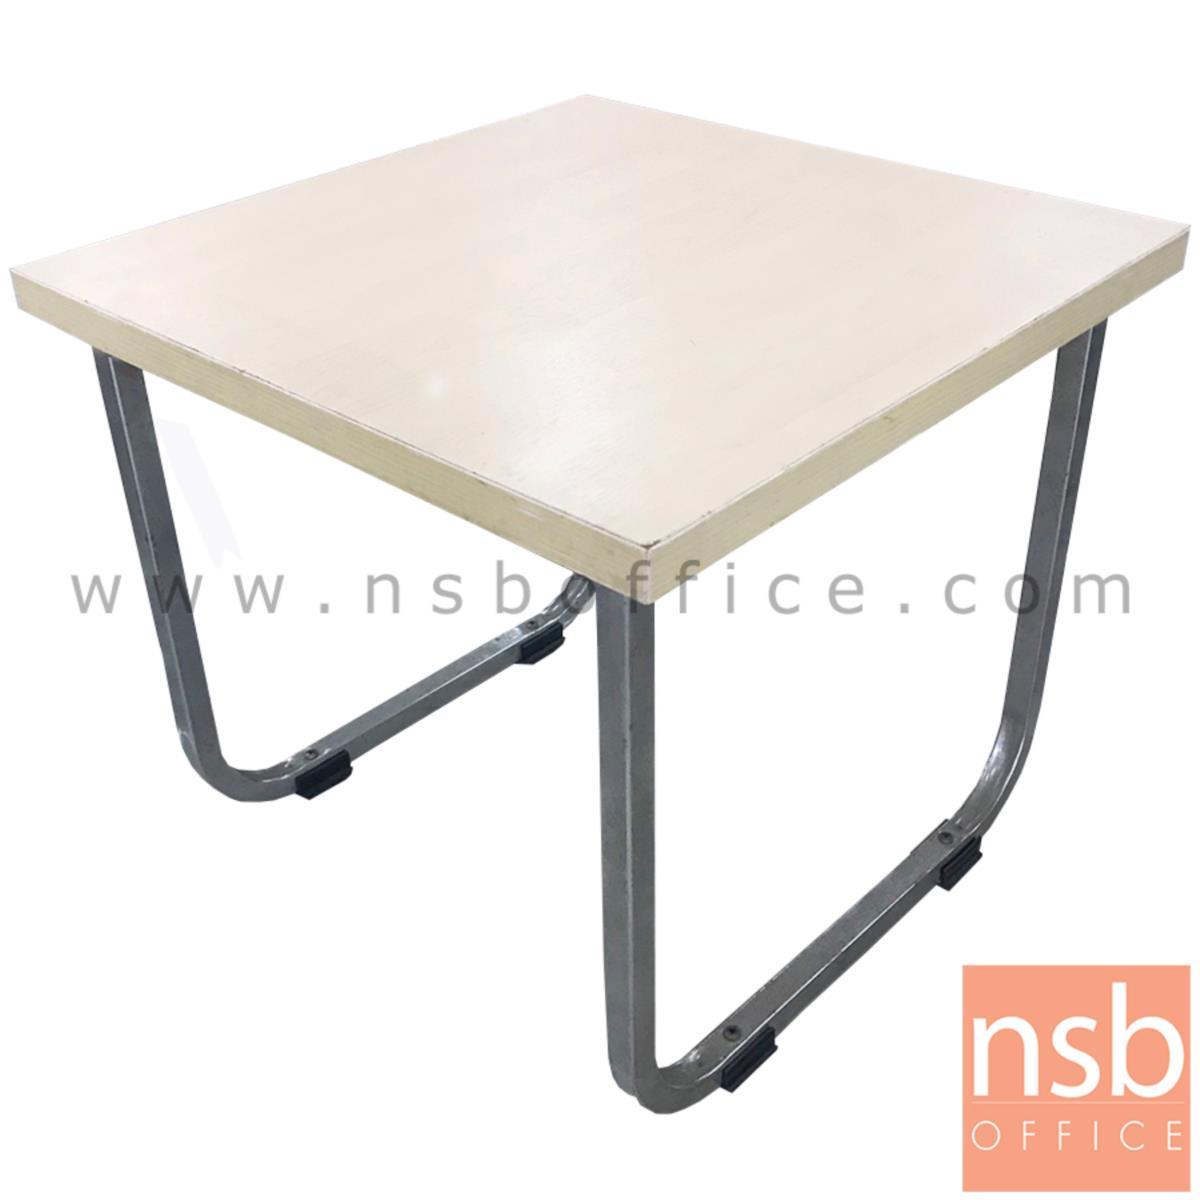 L01A138:โต๊ะกลาง หน้าTOP ไม้เมลามีน  ขนาด 46W*41H cm. ขาเหล็ก